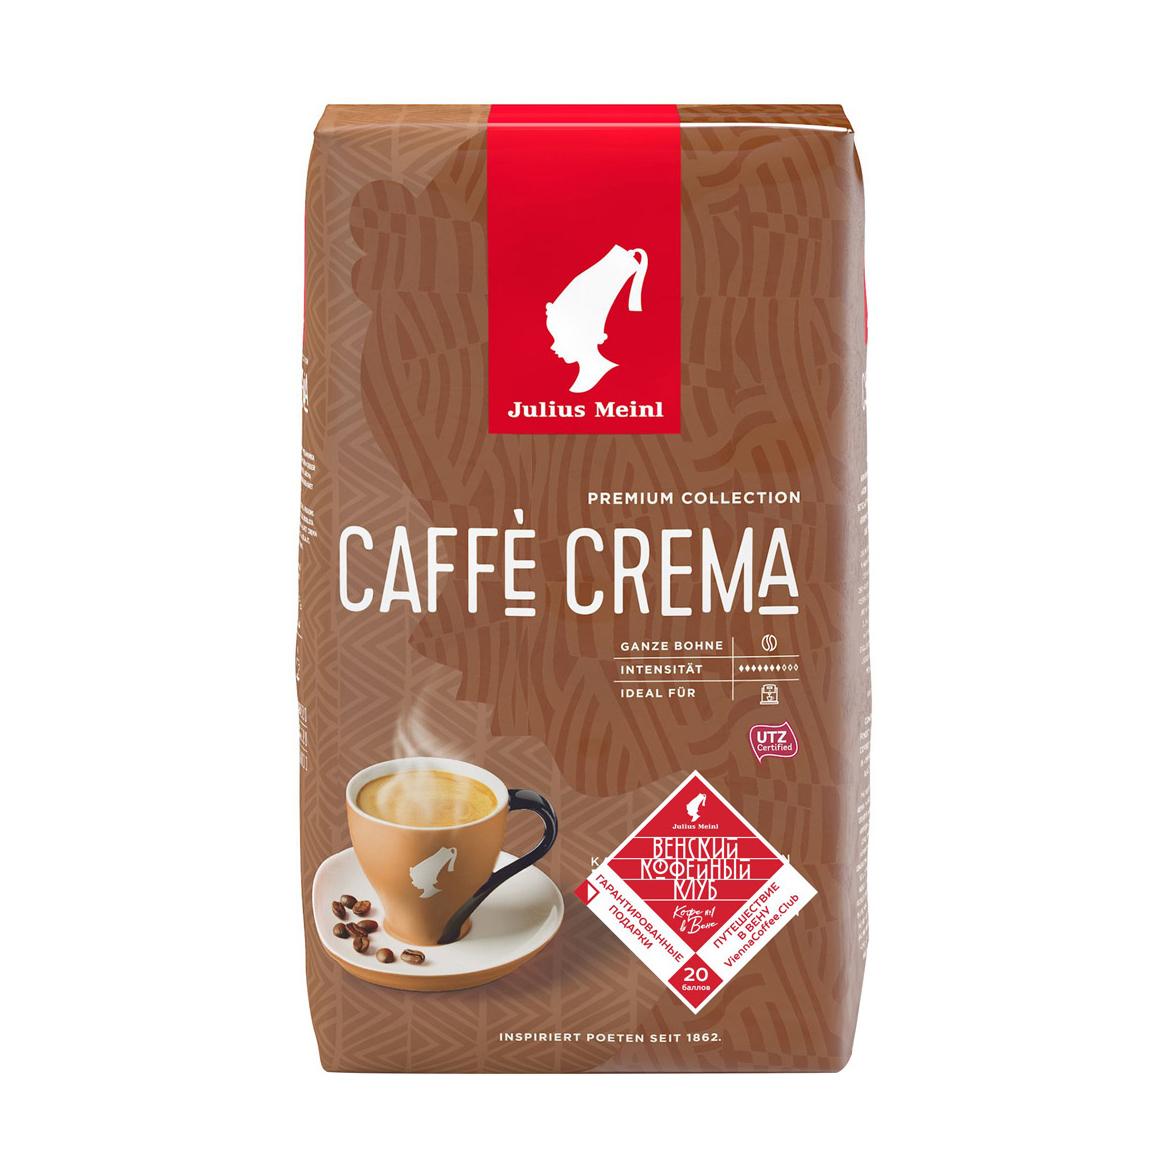 Кофе зерновой Julius Meinl Caffe Crema Premium 1 кг meinl hthh1bk